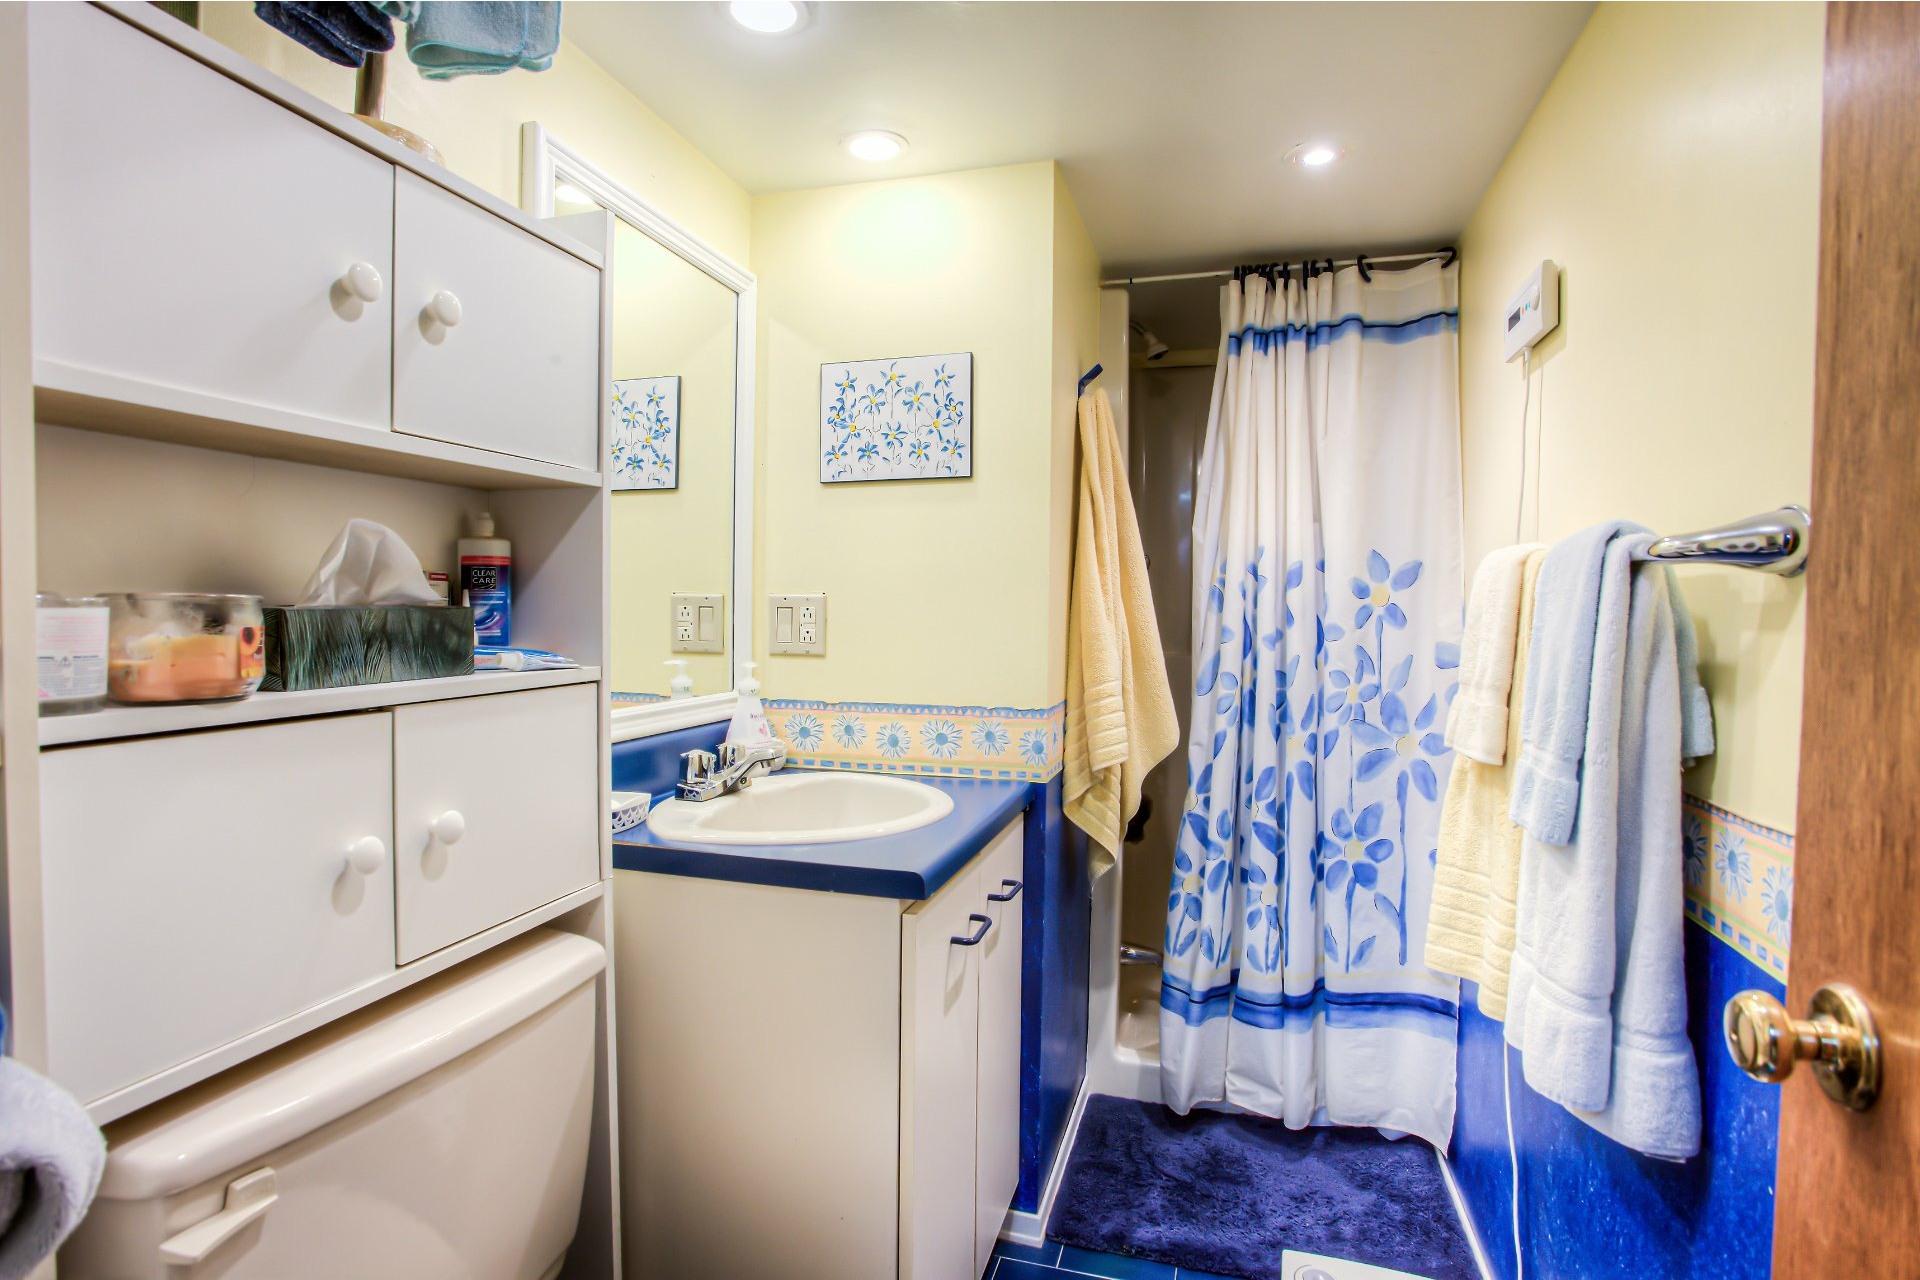 image 18 - MX - Casa sola - MX En venta Dollard-Des Ormeaux - 11 habitaciones